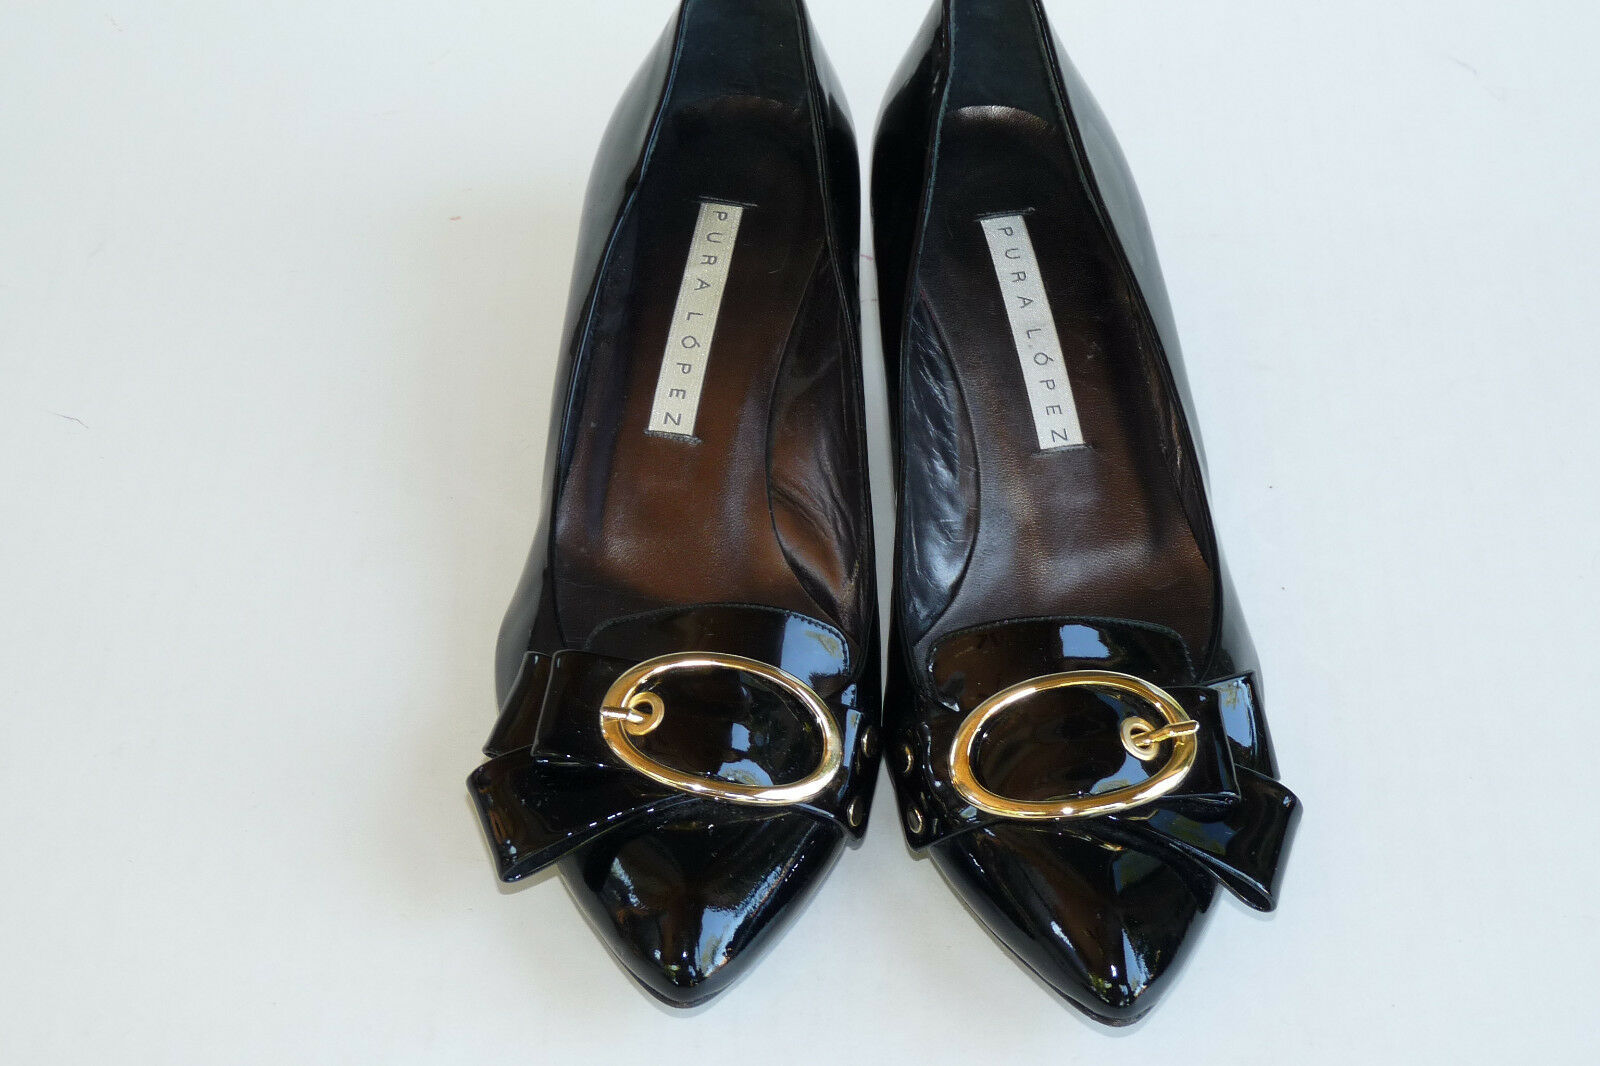 Pura Lopez Slip on Pumps Black Size 39 8 Patent Leather Low Heel Bow